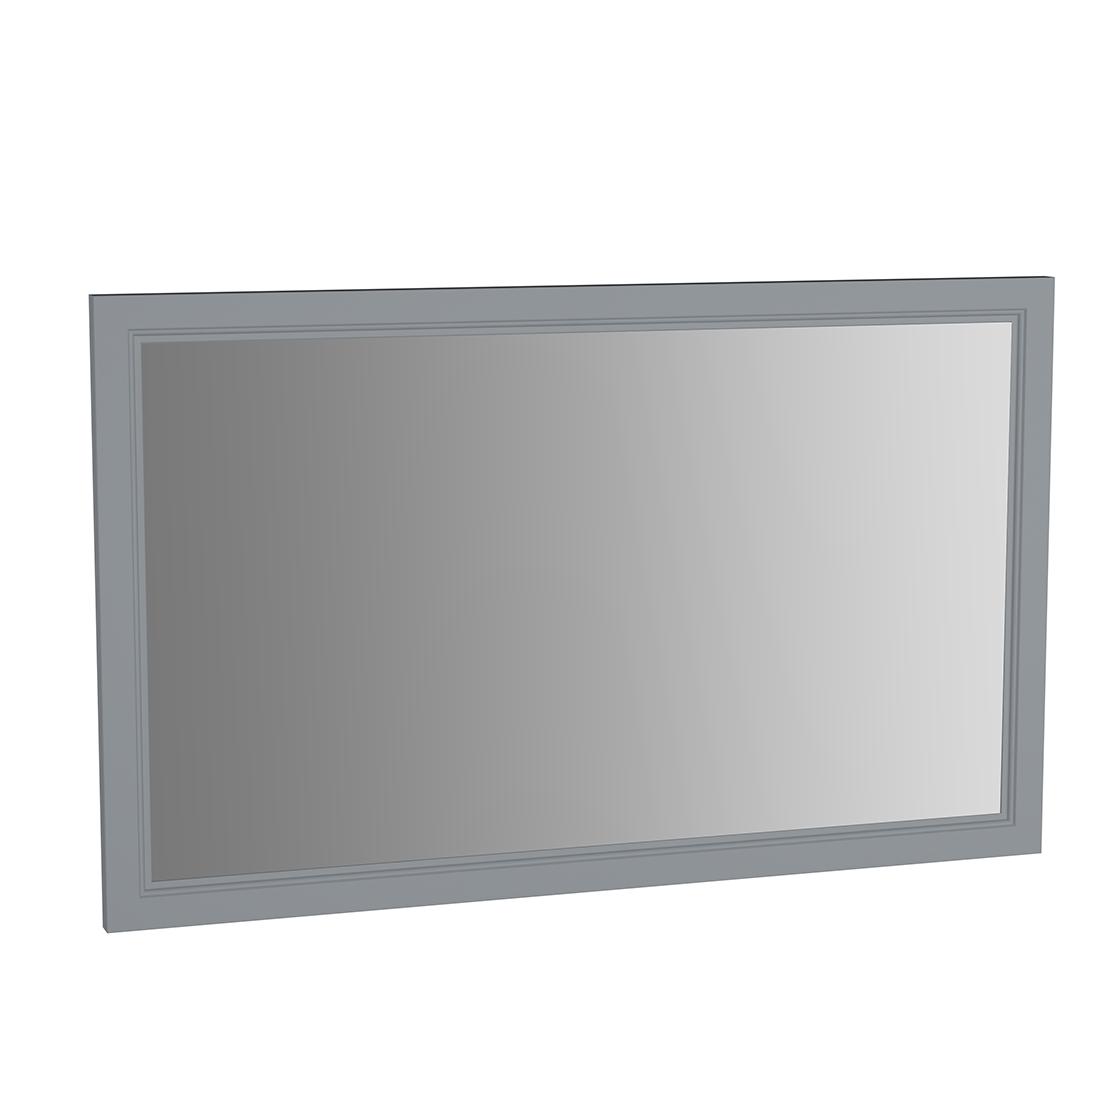 Valarte miroir, 120 cm, gris mat